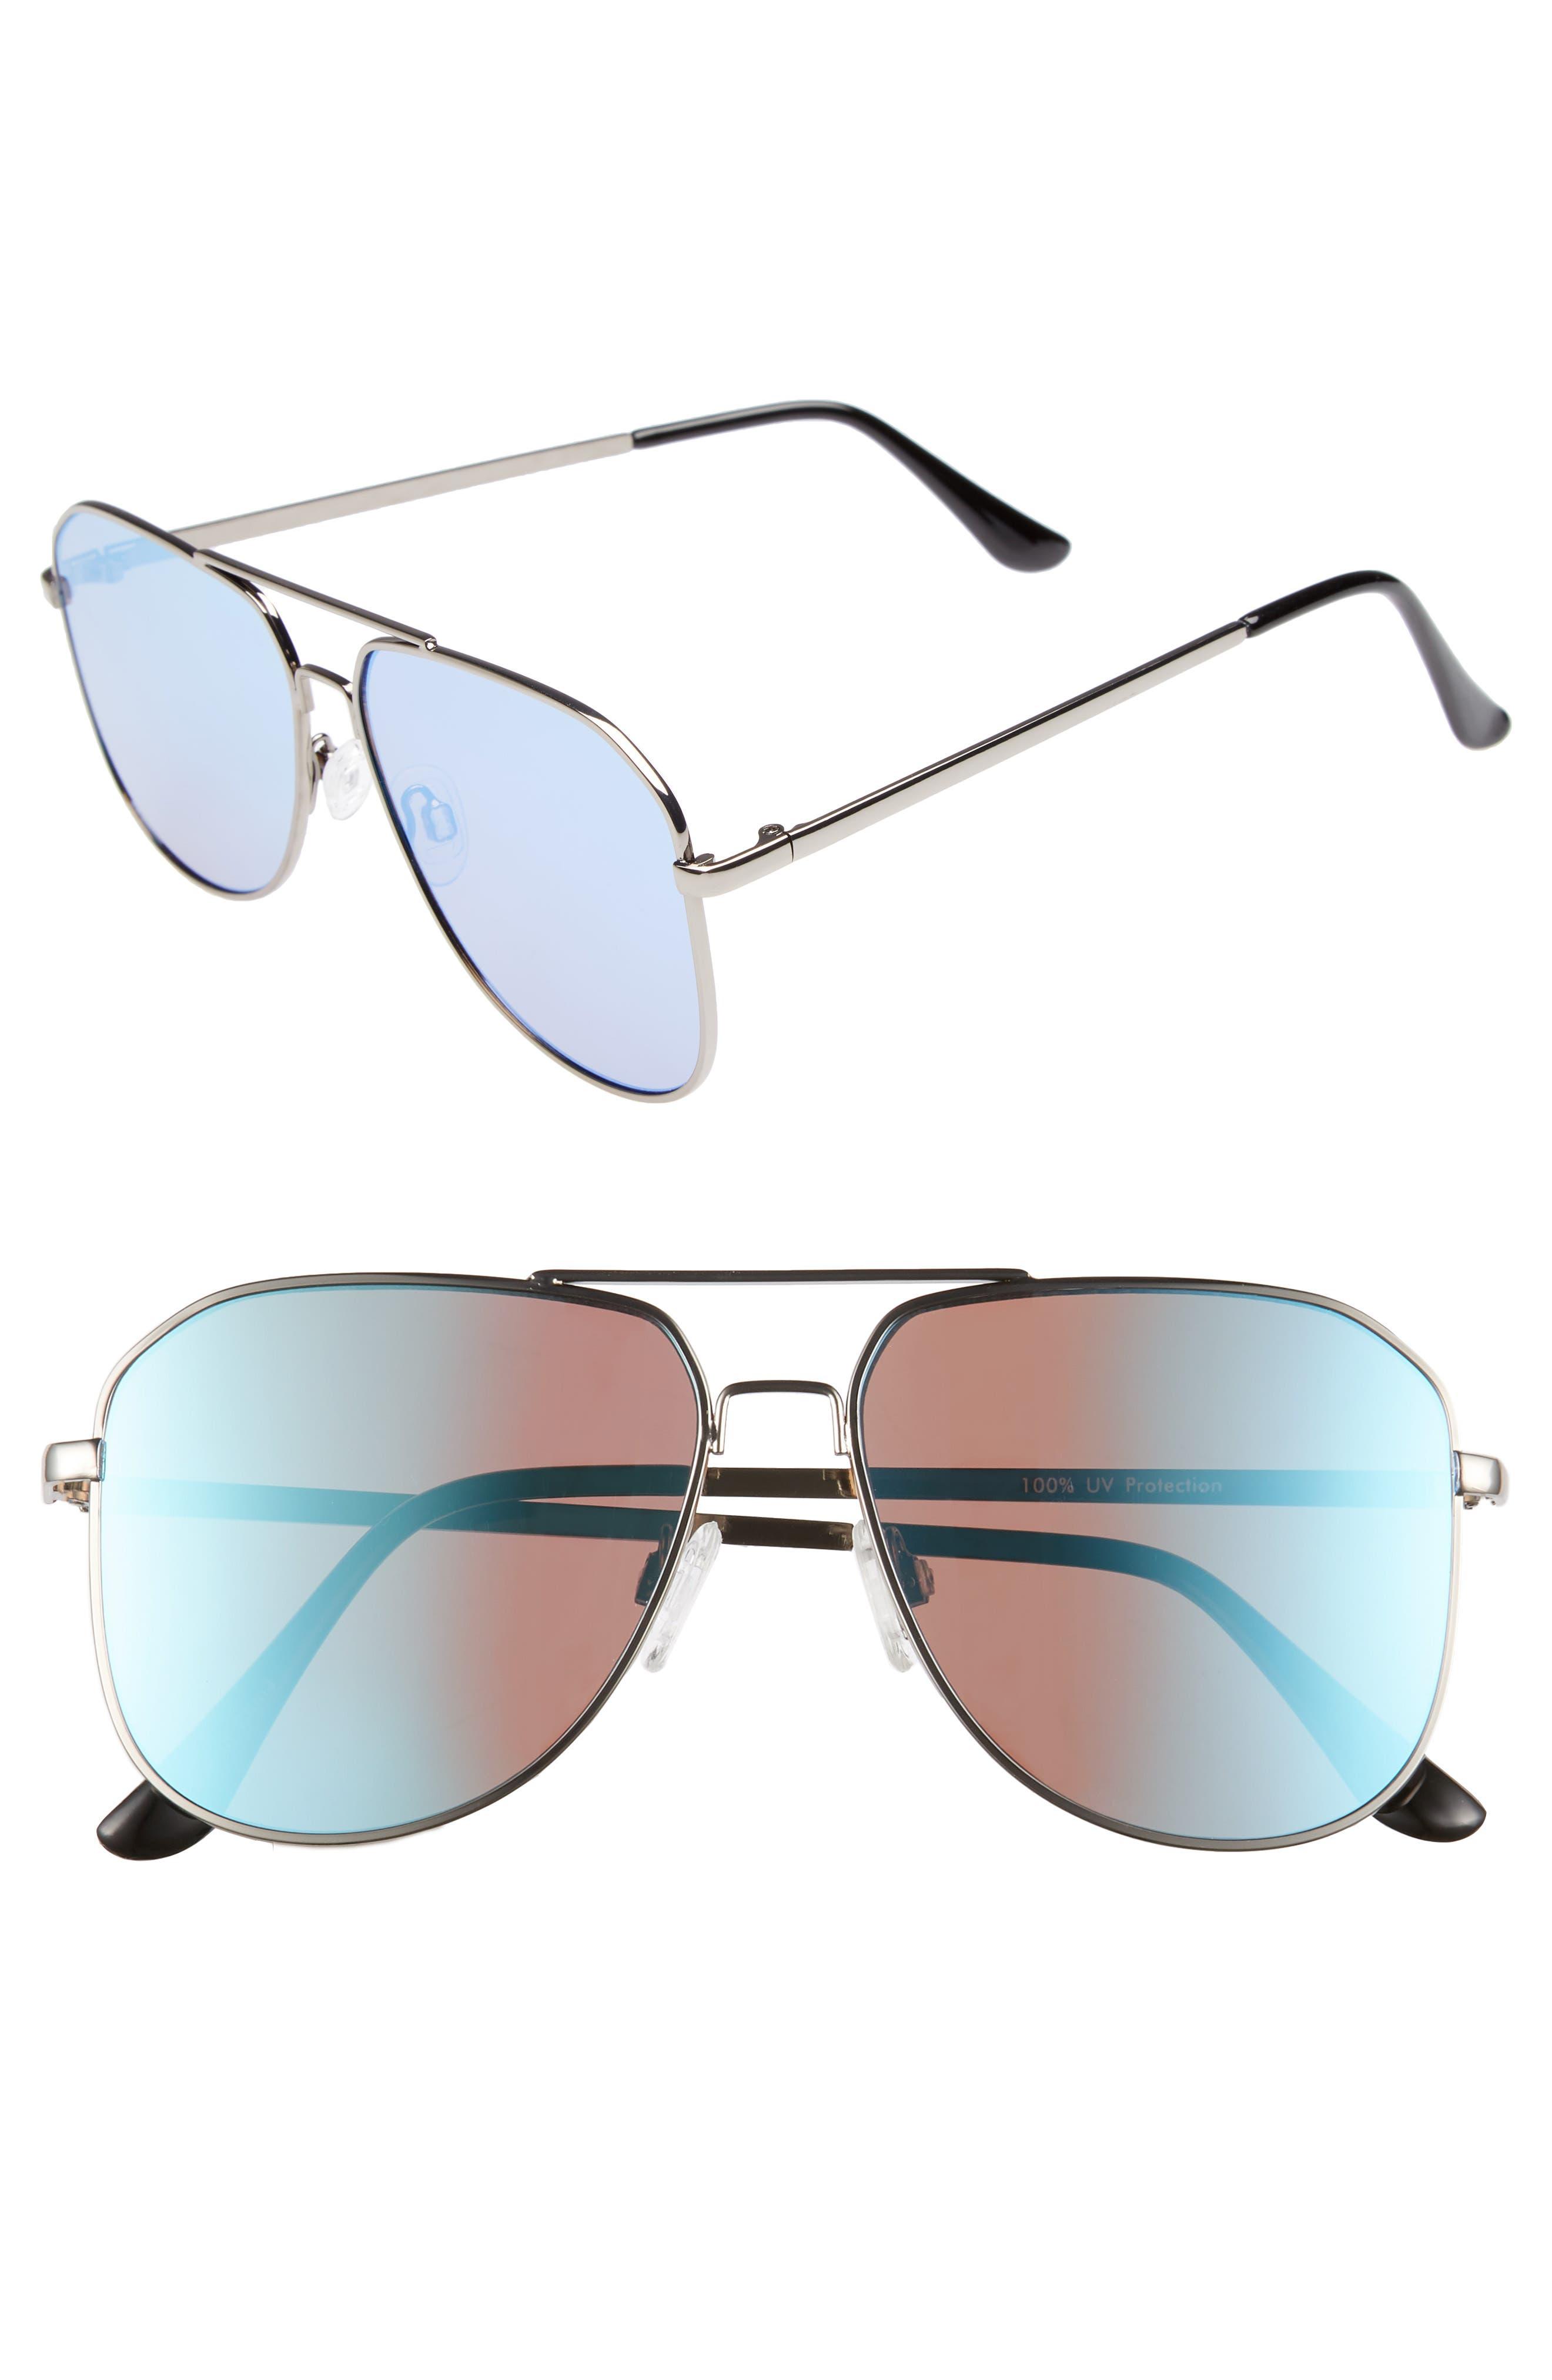 54mm Aviator Sunglasses,                             Main thumbnail 1, color,                             040